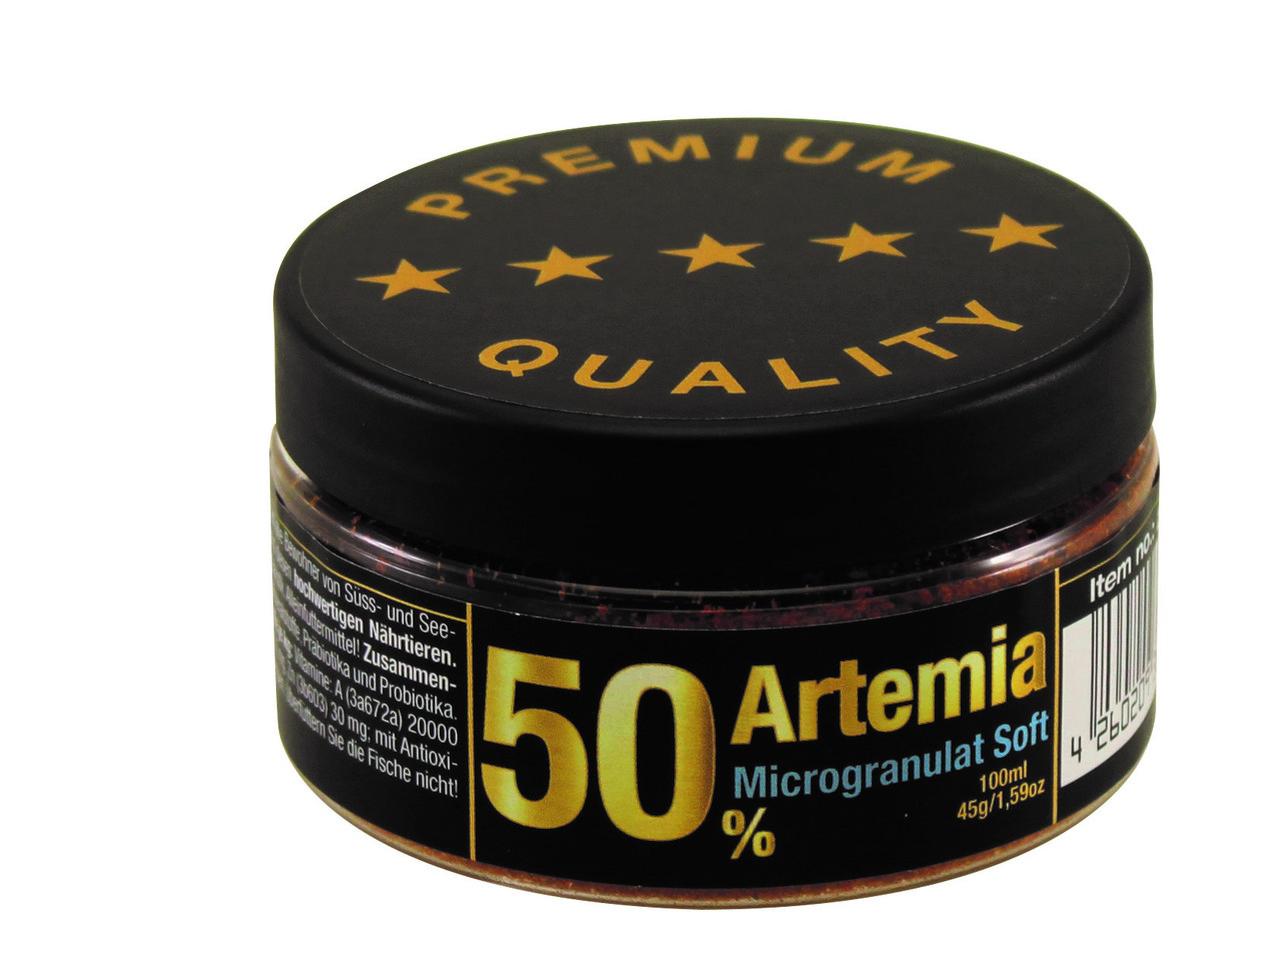 Корм для Дискусов и других рыб. Artemia 50%+ Microgranulate Discusfood. Микрогранулы.